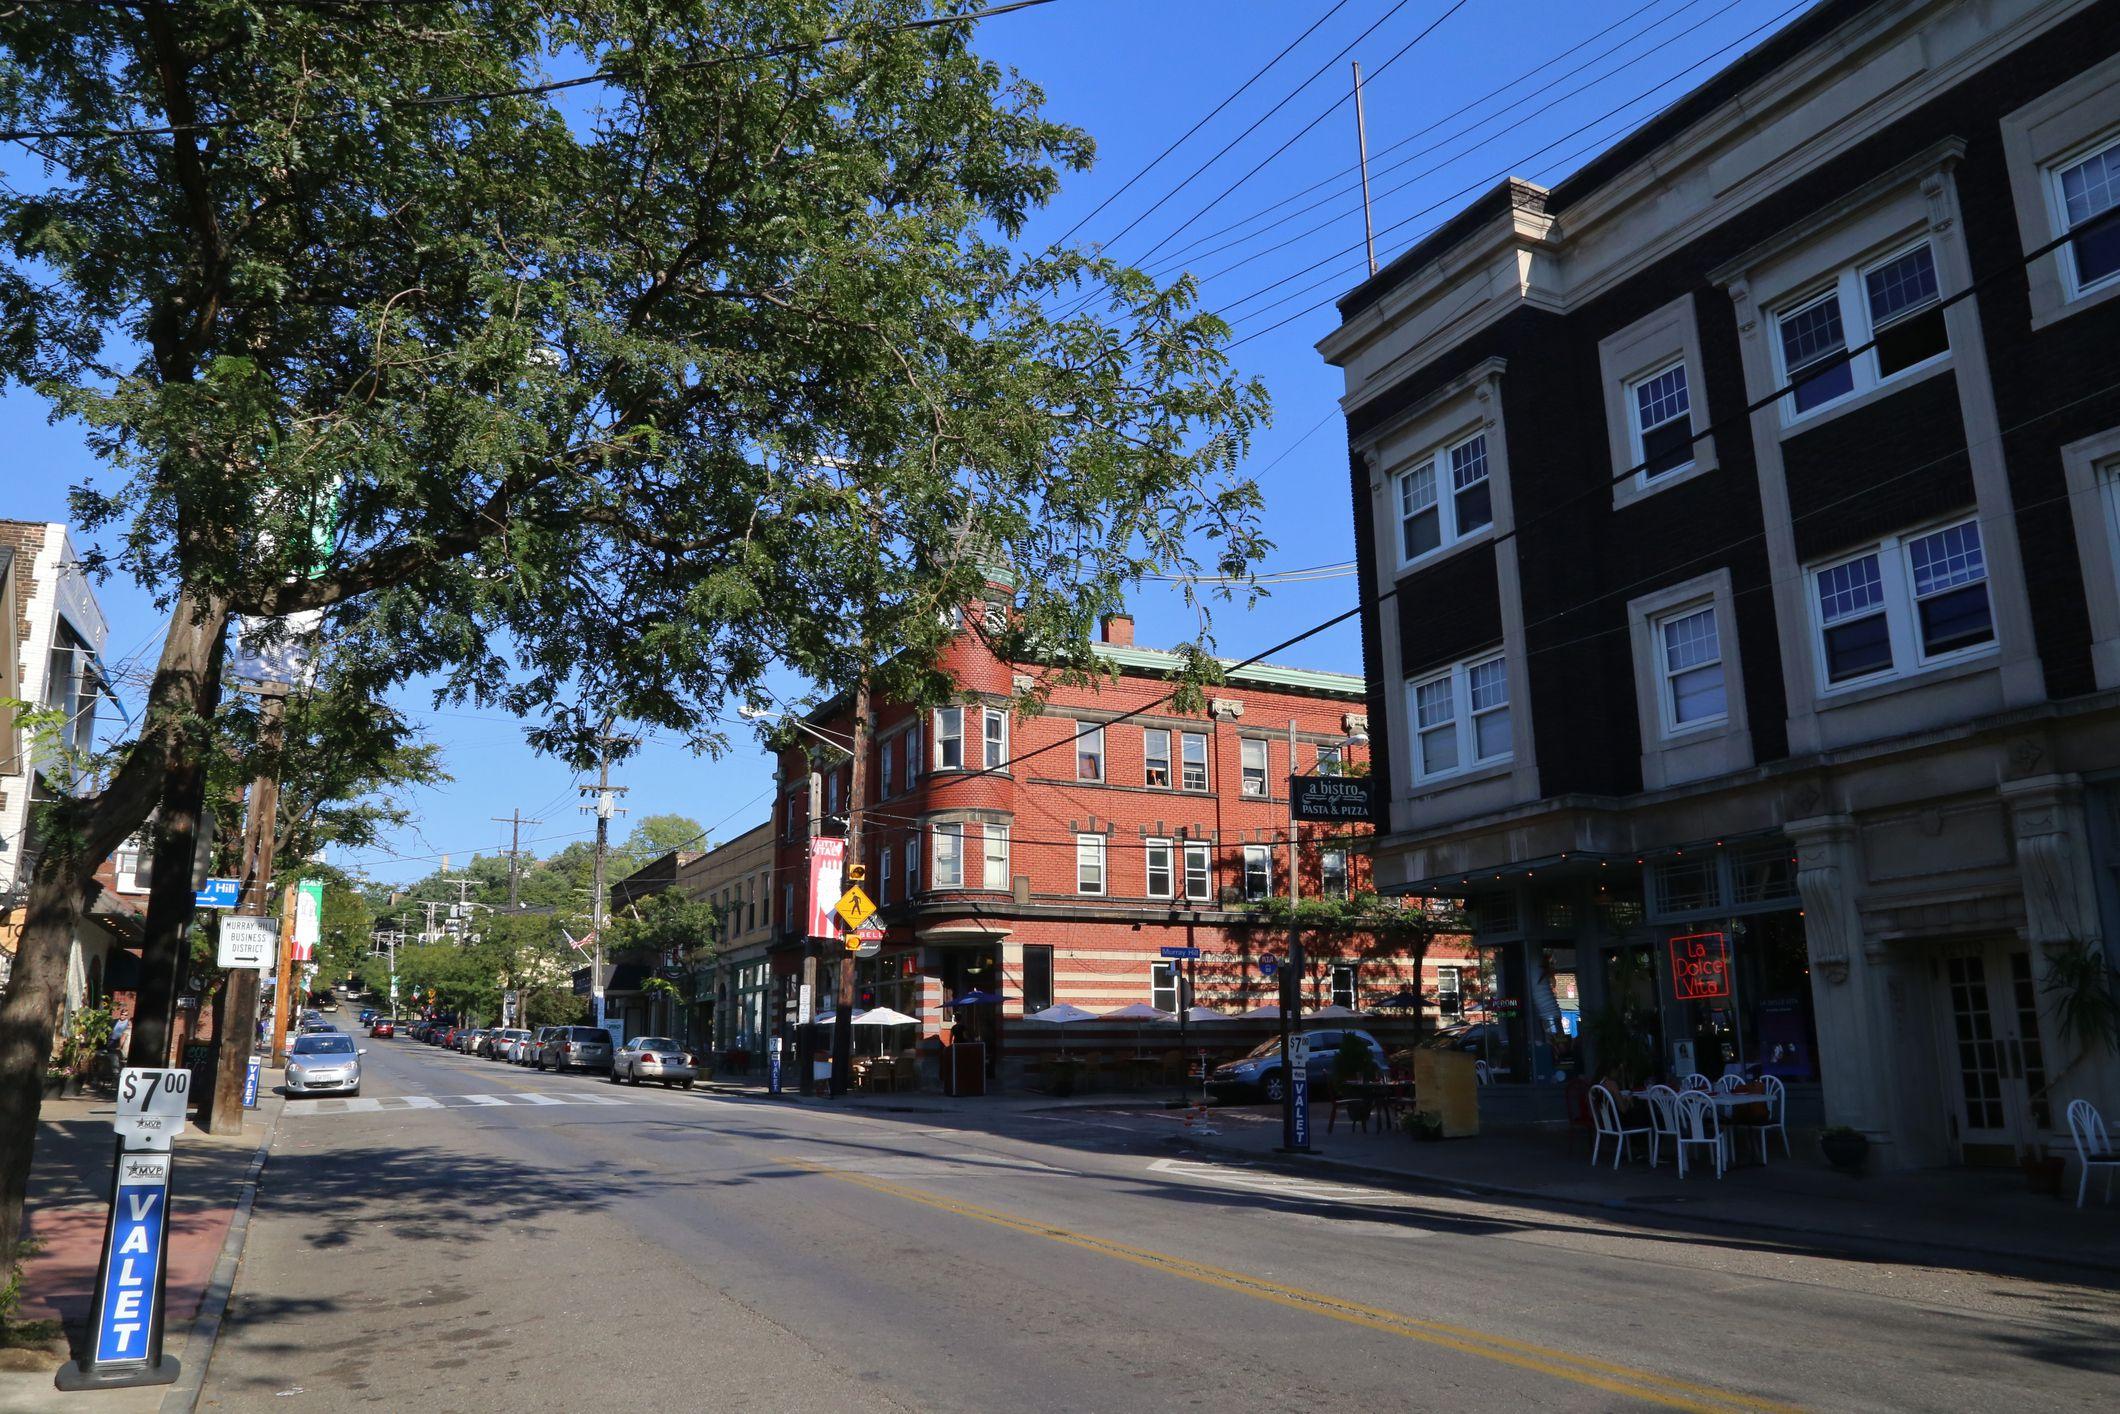 Neighborhoods And Suburbs Of Cleveland